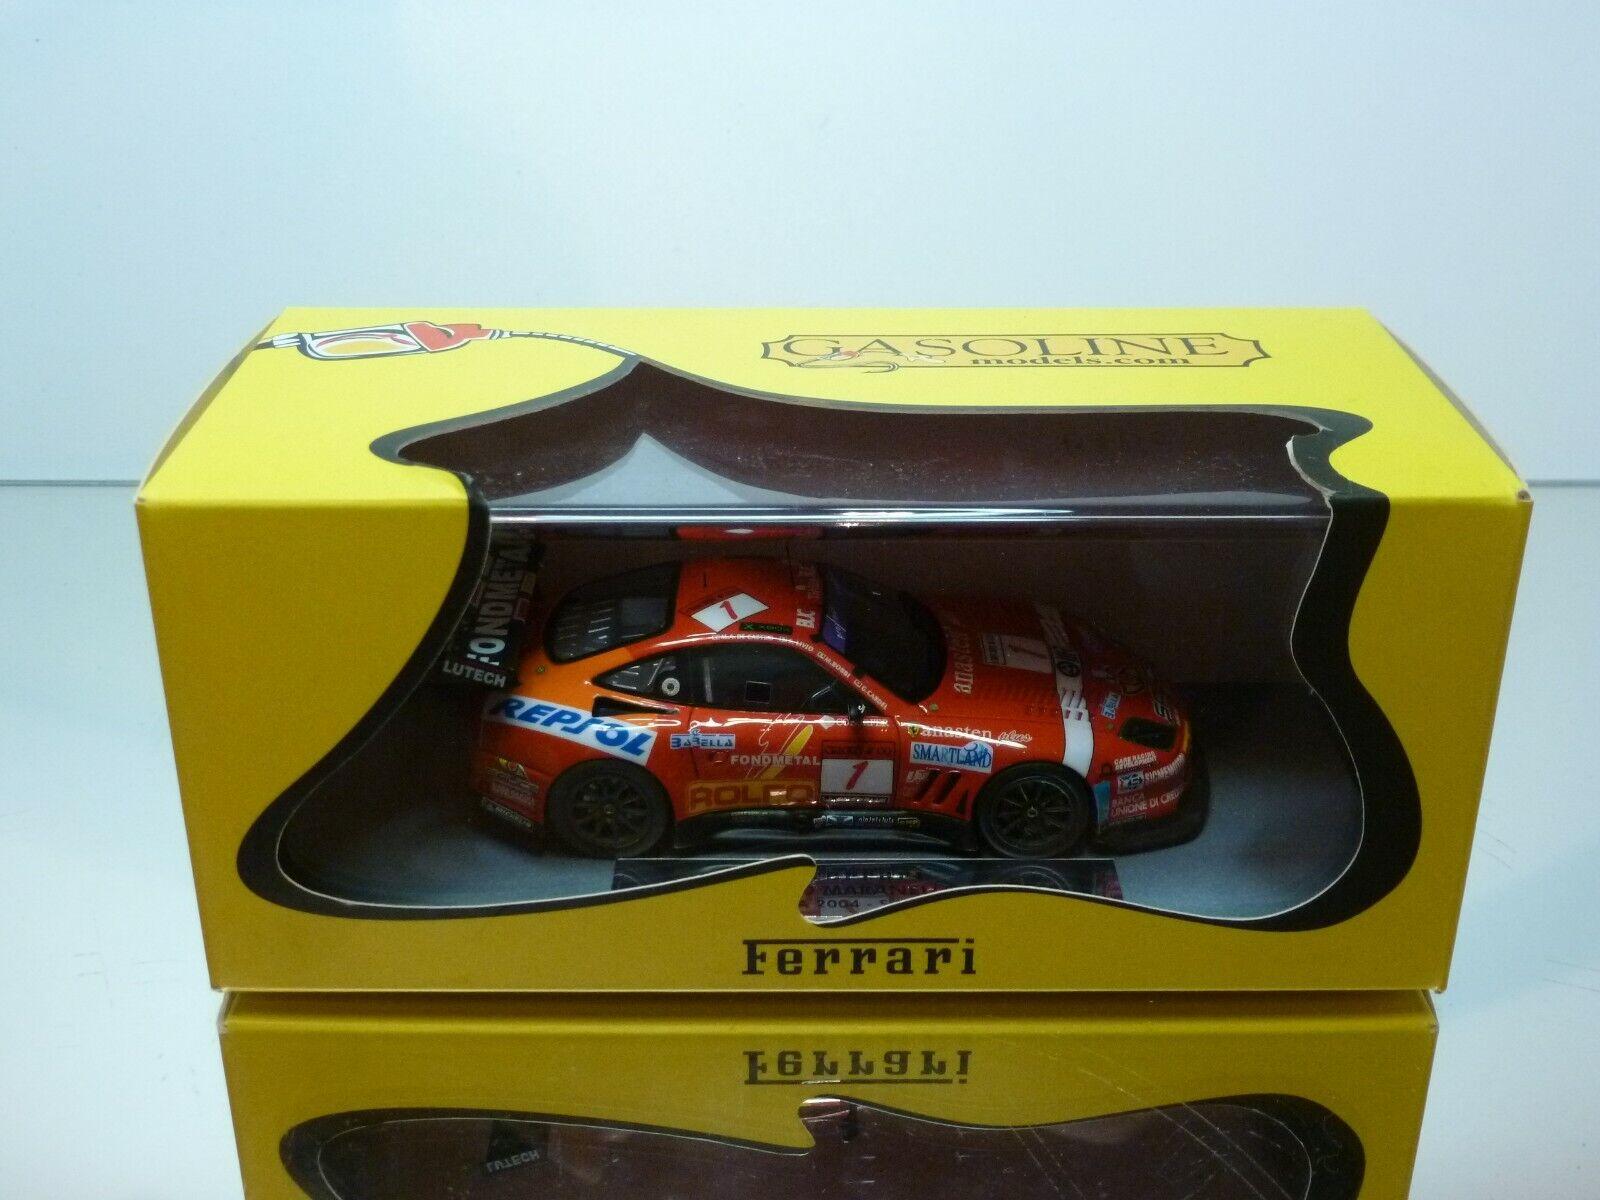 BBR GASOLINE MODELS FERRARI 550 24h SPA 2004 SCUDERIA ITALIA - 1 43 -MINT IN BOX